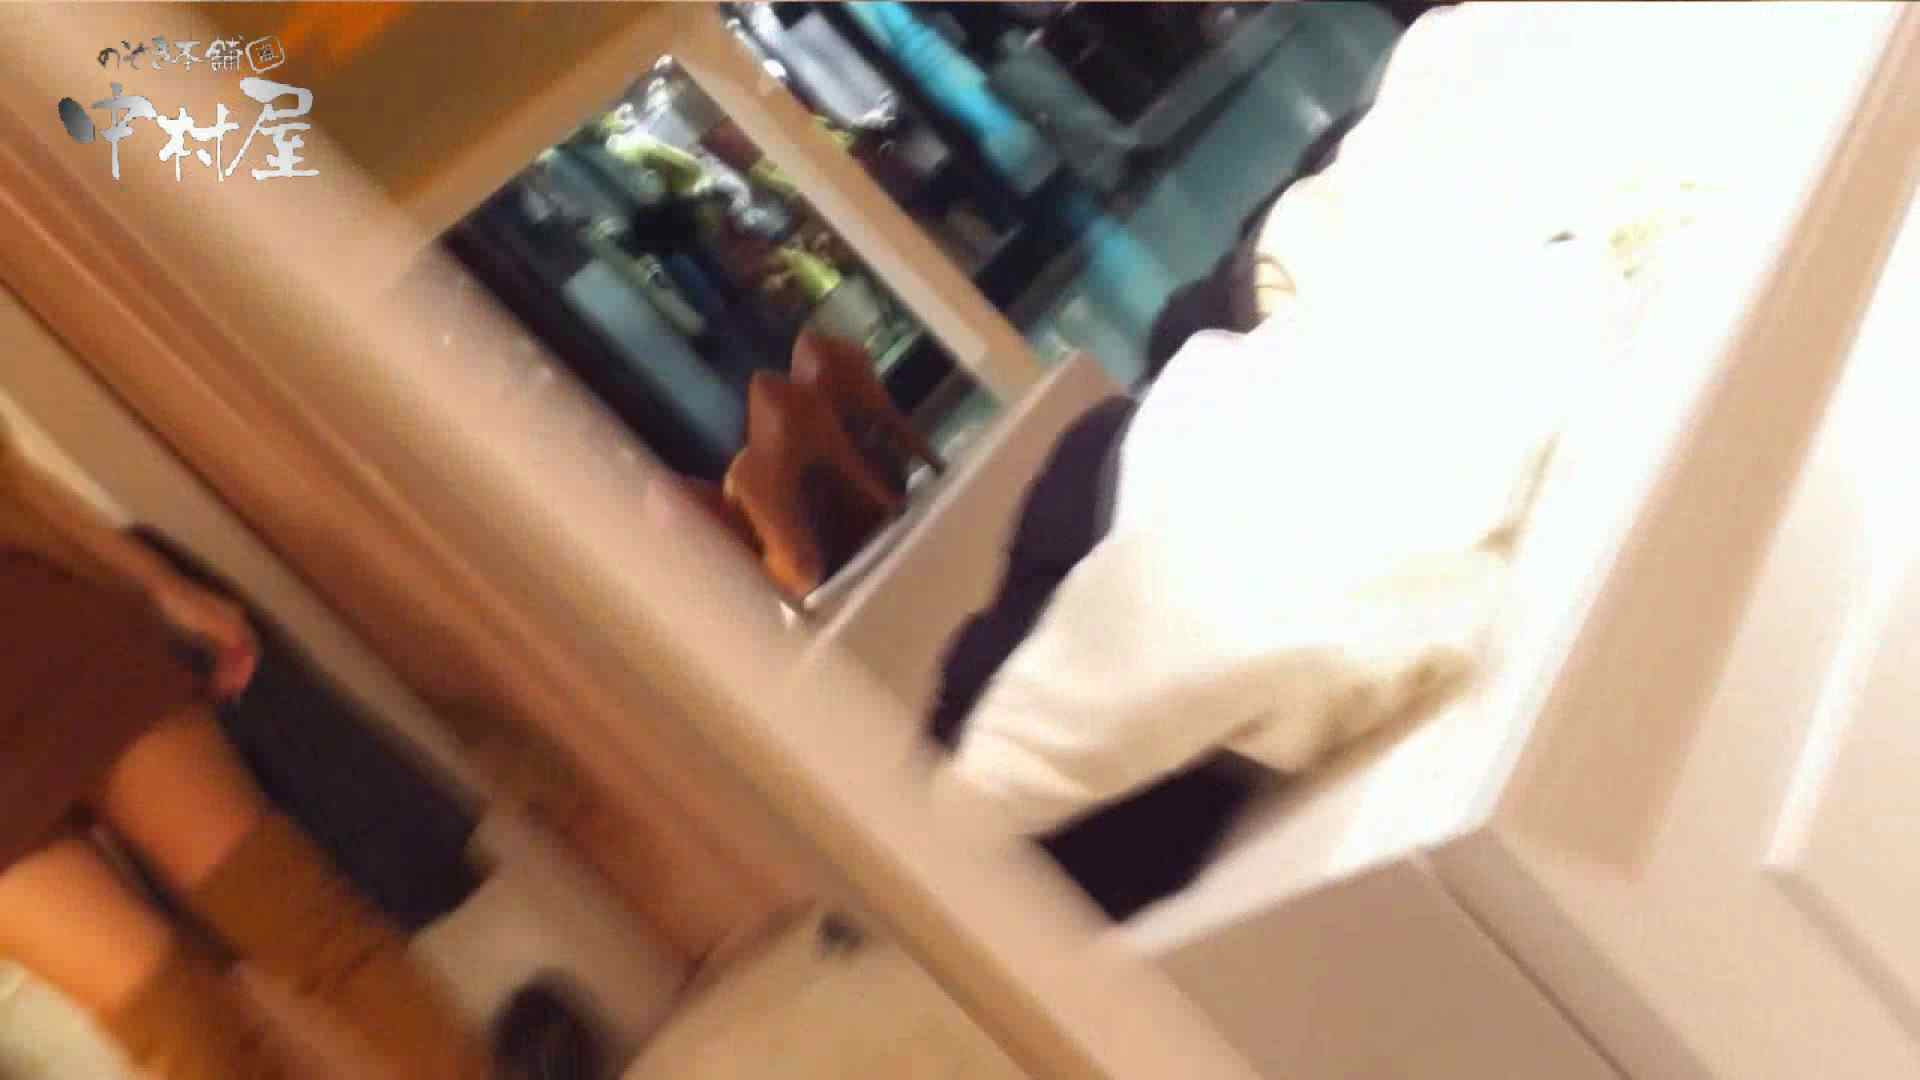 vol.46 可愛いカリスマ店員胸チラ&パンチラ モリマン! おまんこ無修正 盗み撮り動画 72画像 9